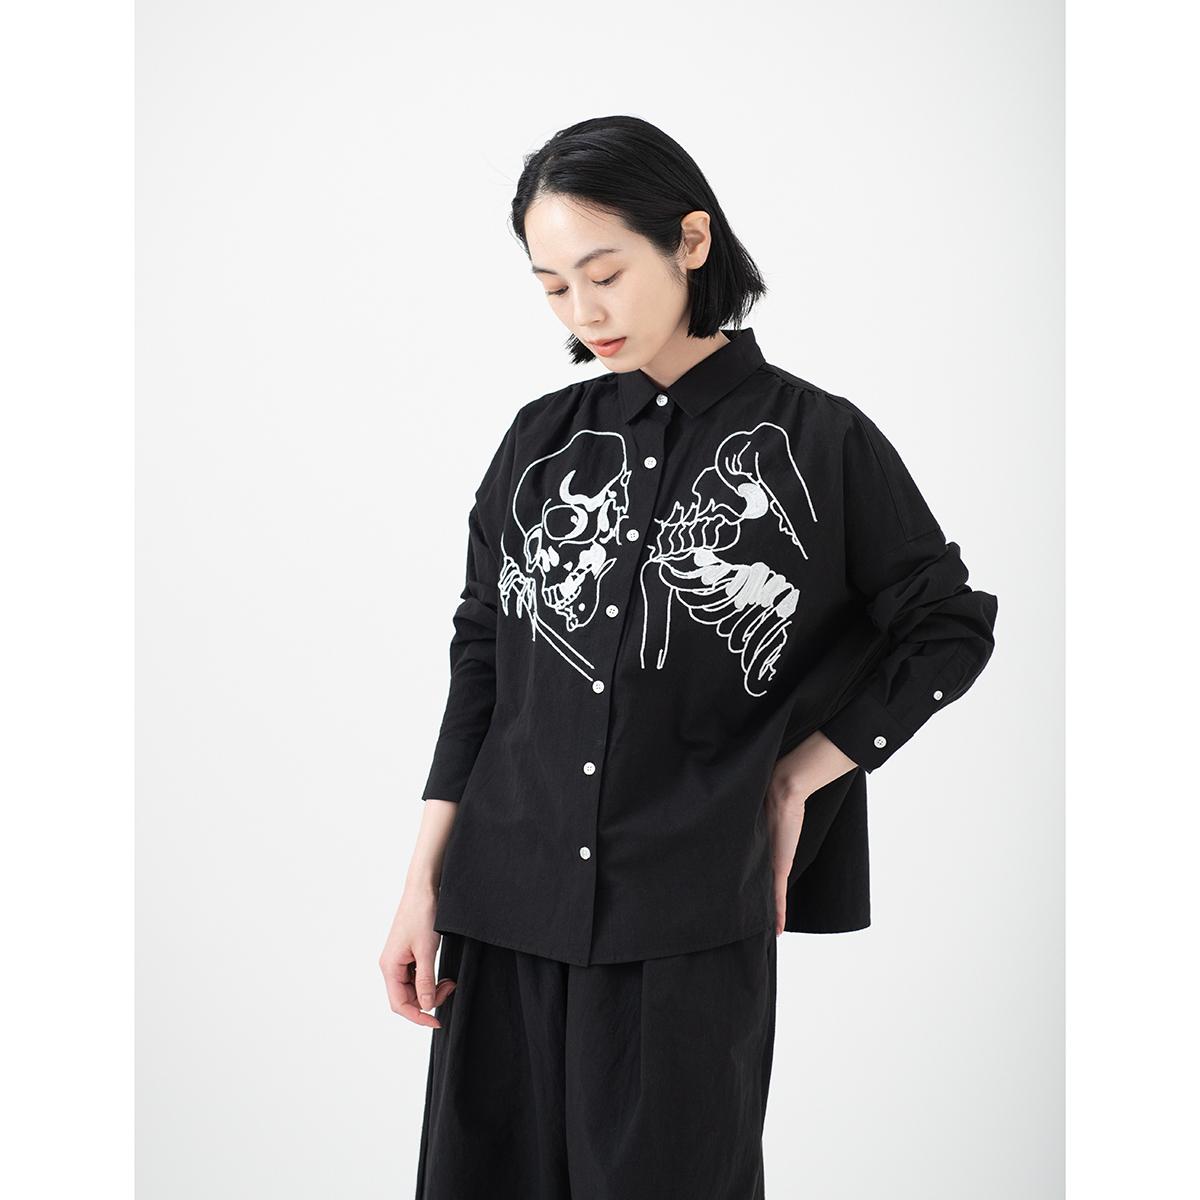 KY17-804AB/綿麻ワイドシャツ[播州織]/相馬の古内裏(黒)